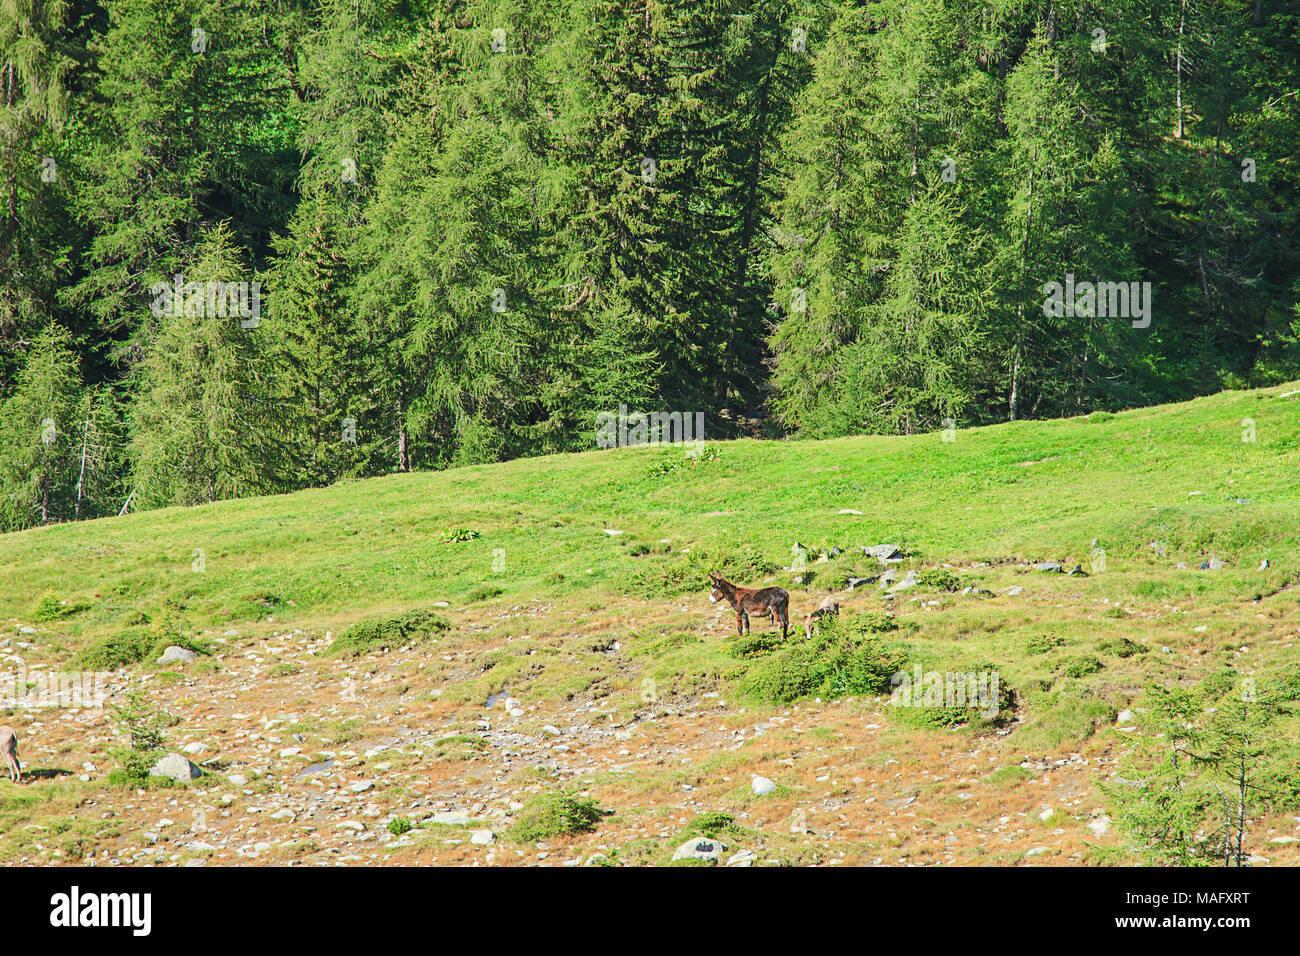 Pass of the cow from Tito Secchi refuge in Valsabbia, Brescia, Italy. - Stock Image